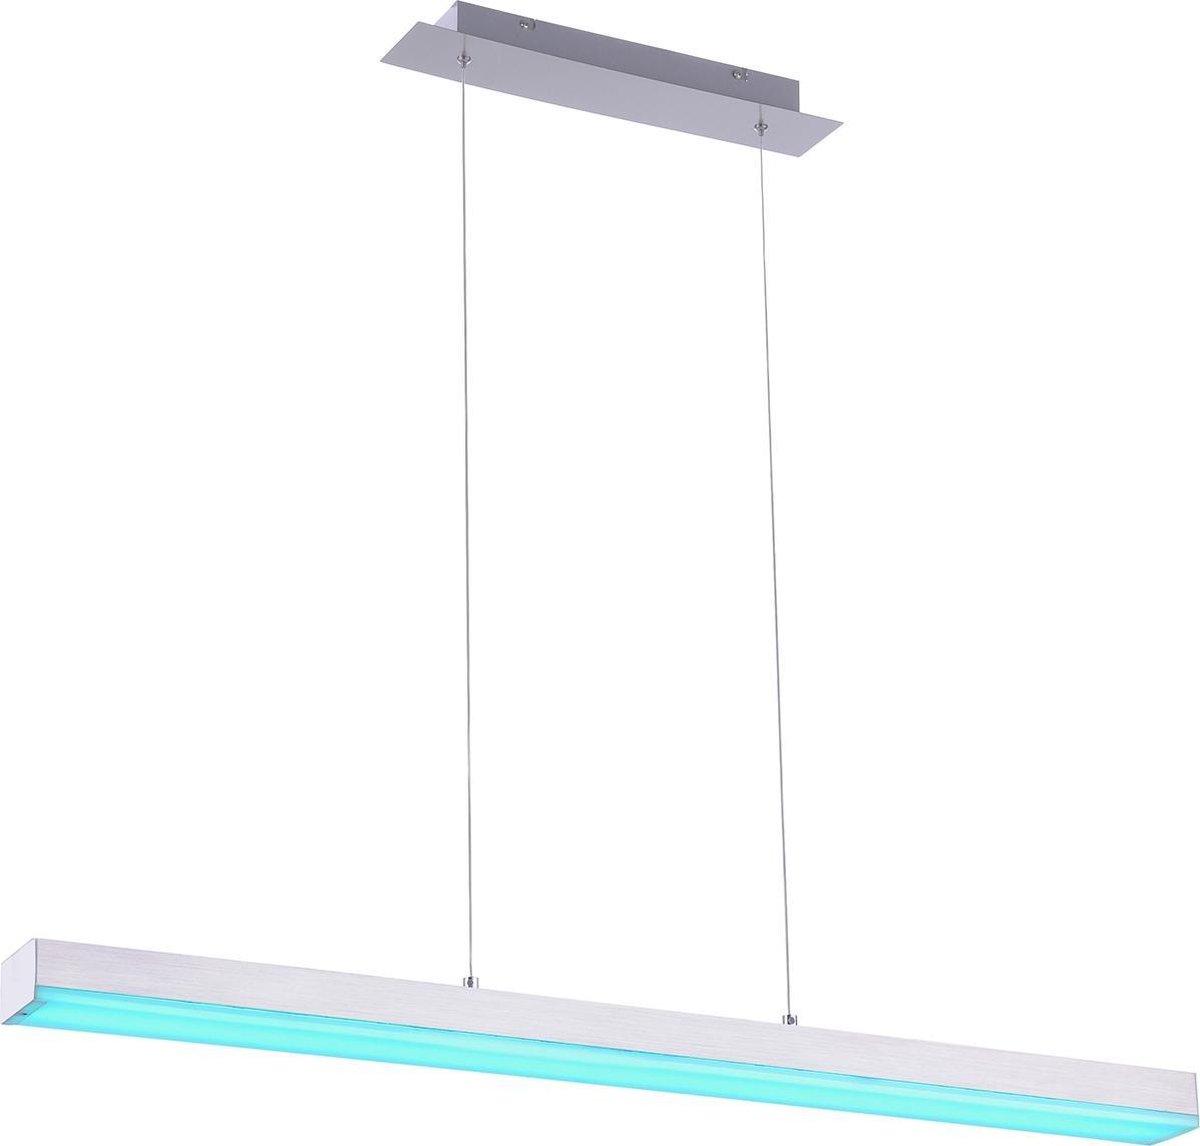 LED Hanglamp WiZ - Smart LED - Hangverlichting - Trion Lavar - 20W - Aanpasbare Kleur - RGBW - Rechthoek - Mat Nikkel - Aluminium - BSE